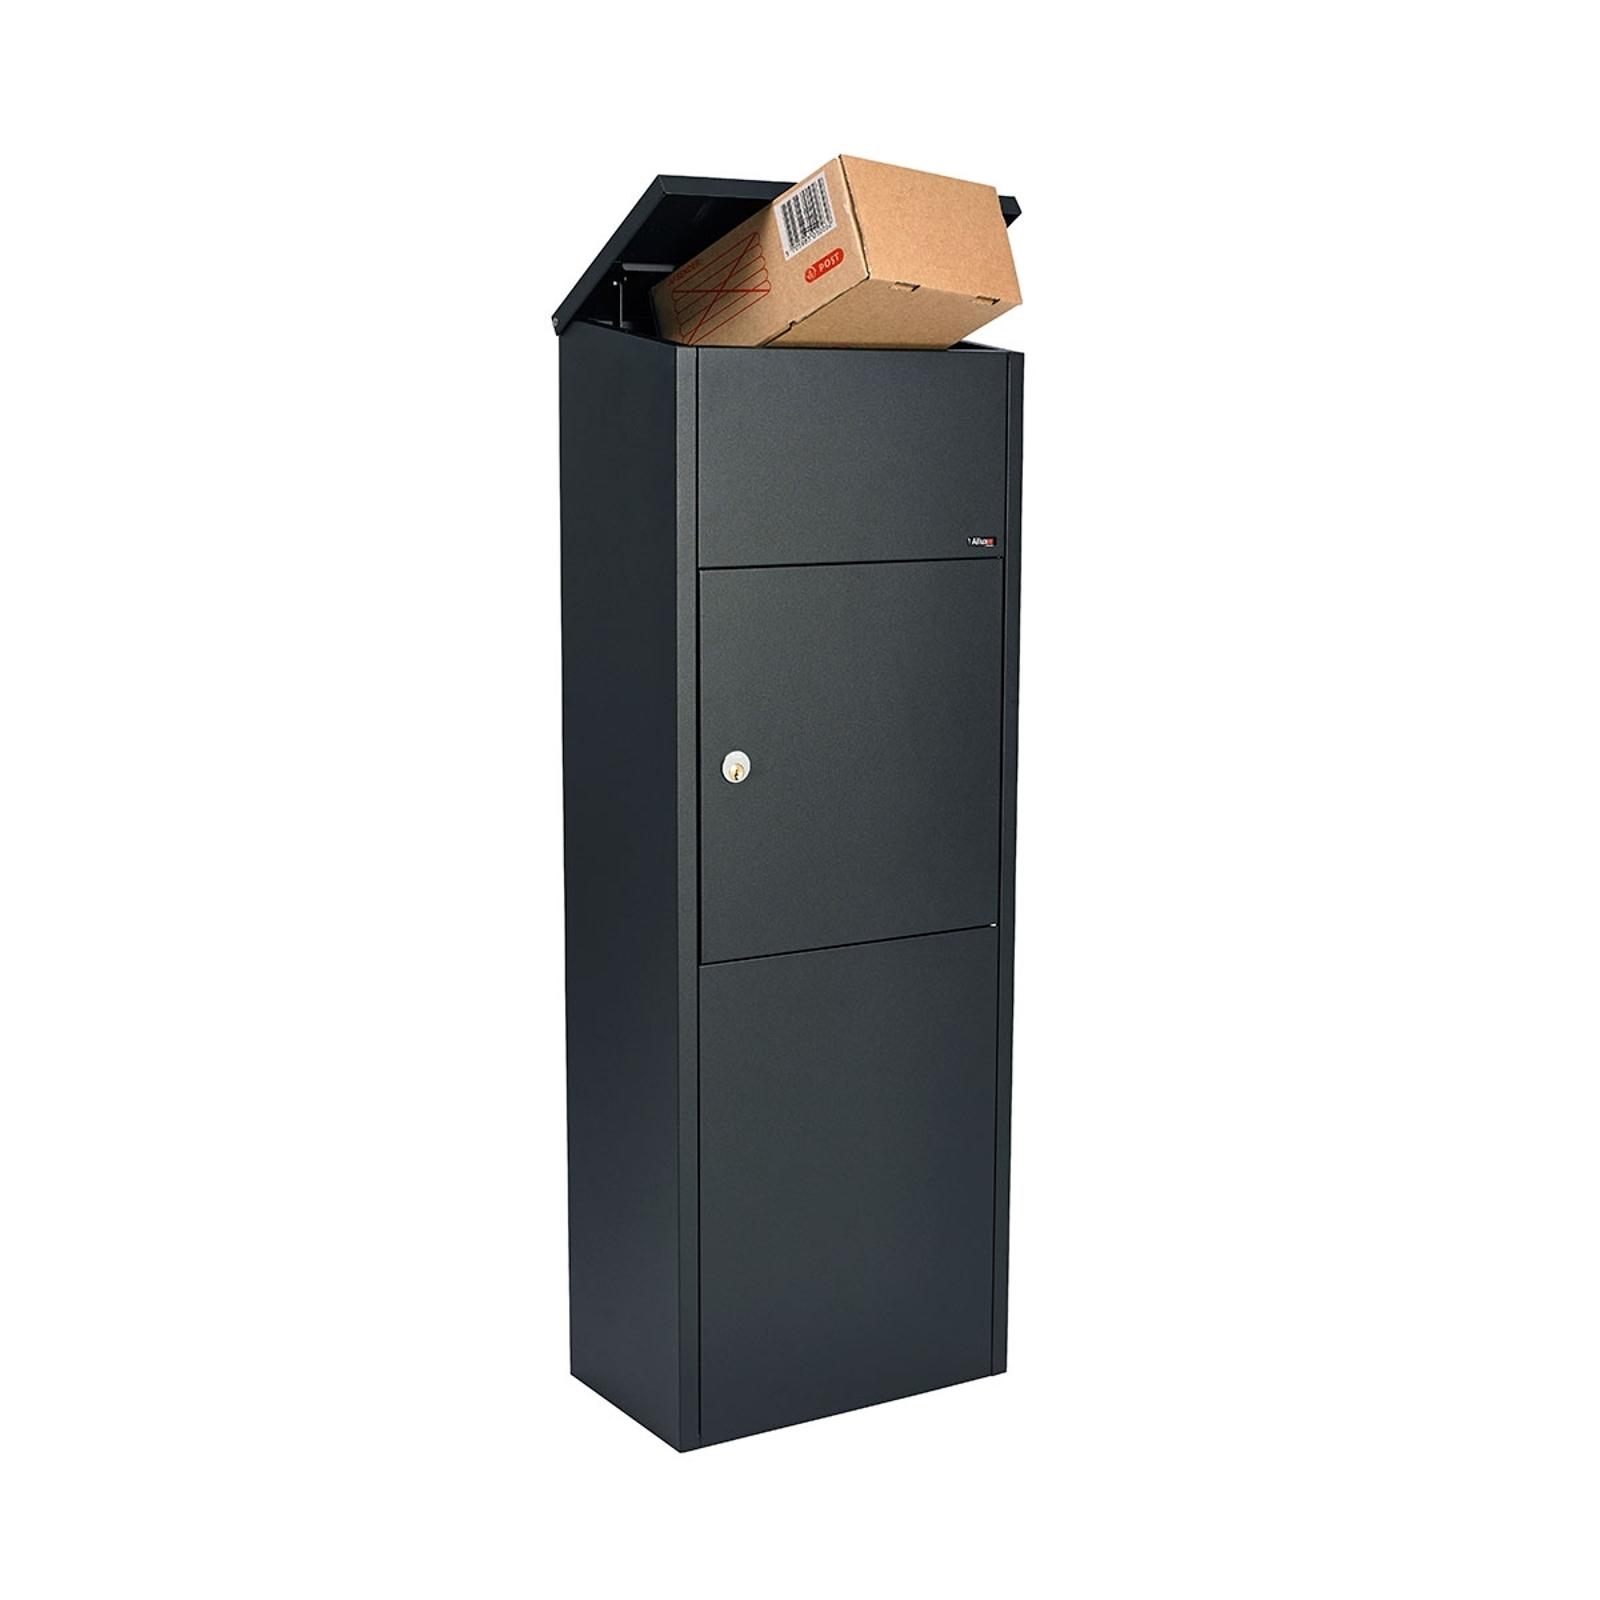 Brev-/pakkepostkasse 600S med Ruko-lås